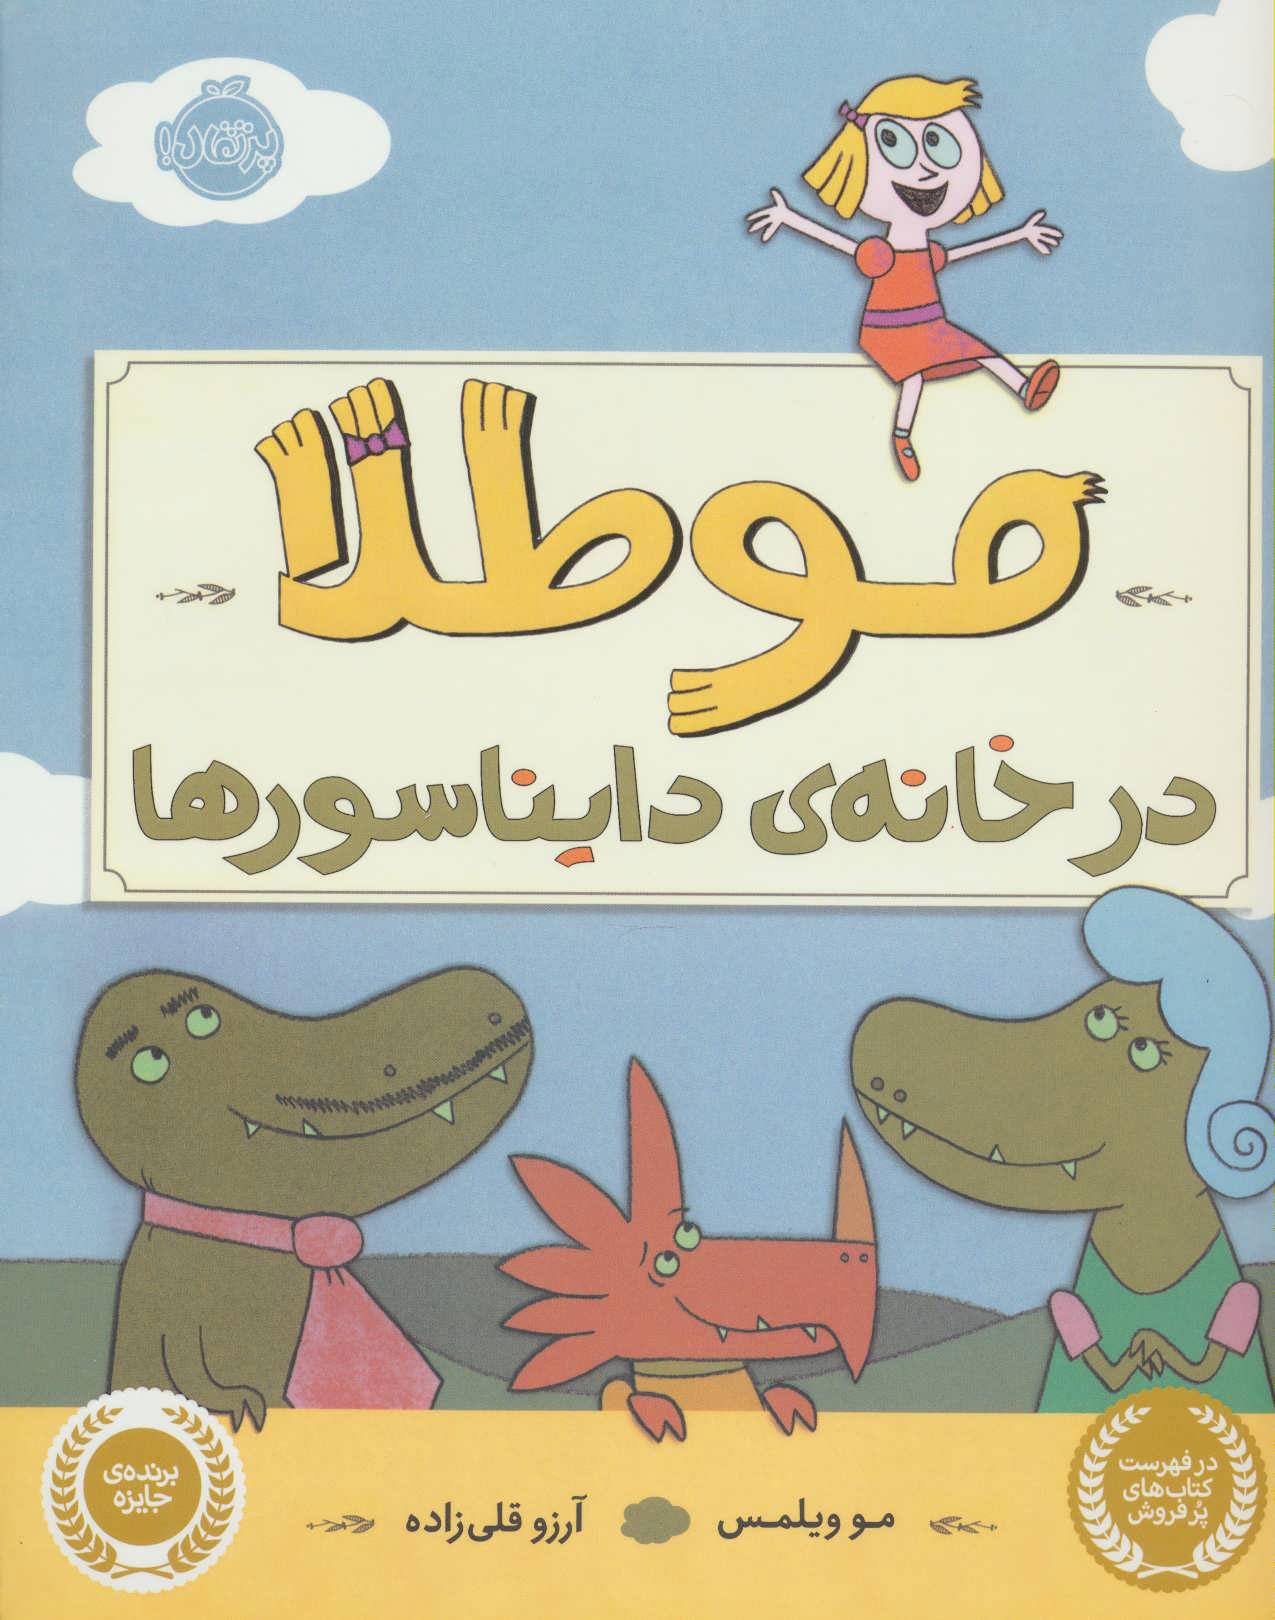 کتاب مو طلا در خانه ی دایناسورها